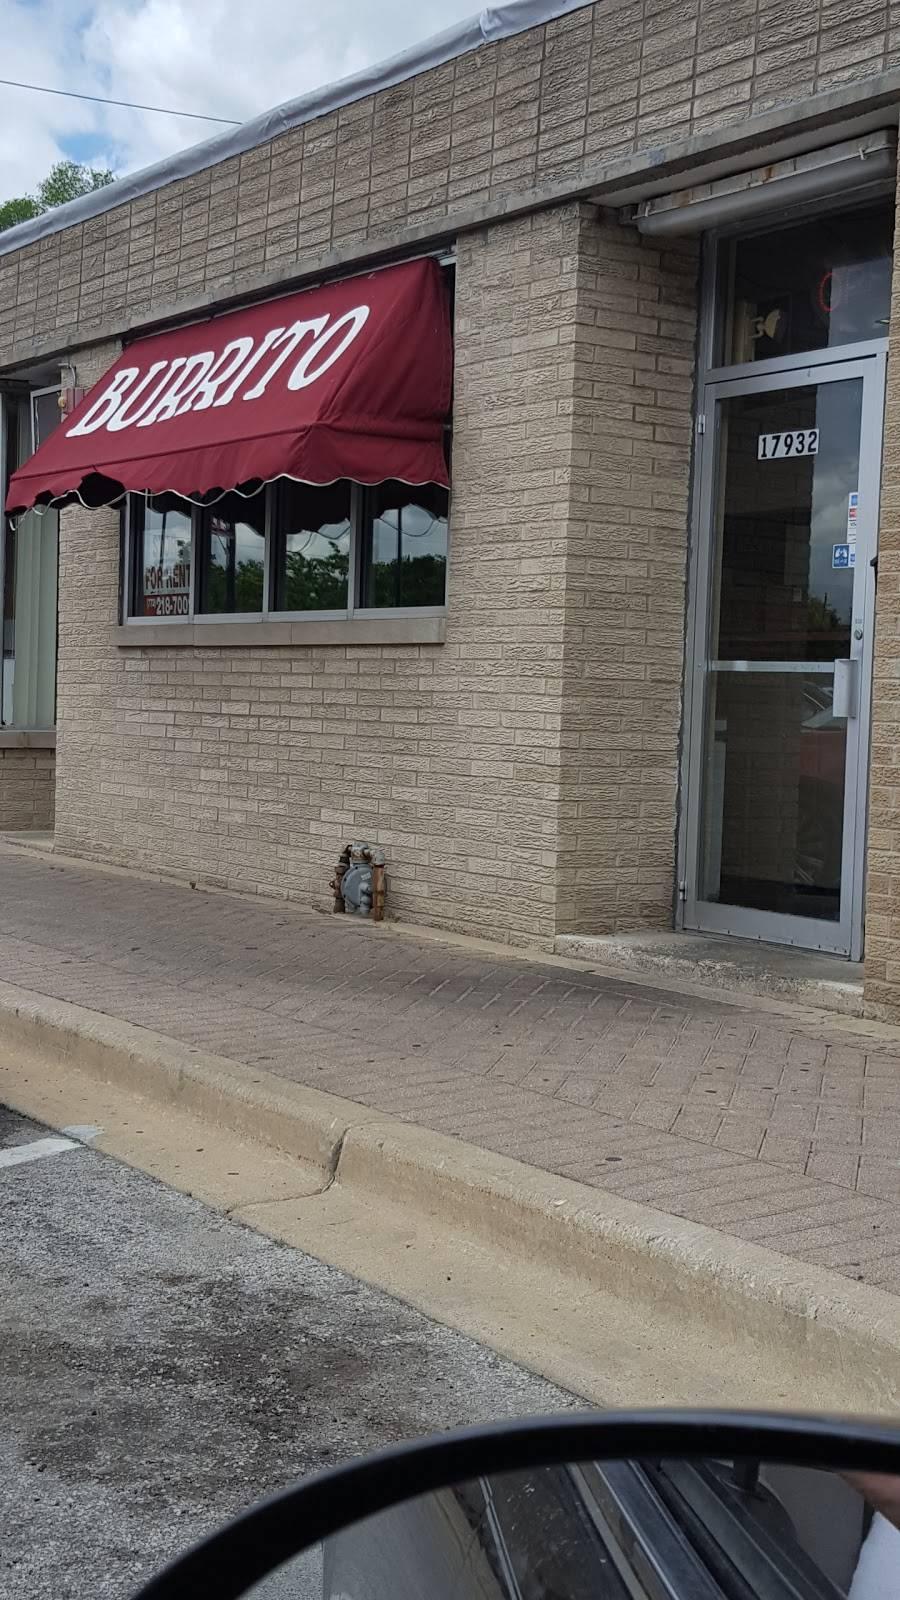 Burrito Express | restaurant | 17932 Dixie Hwy, Homewood, IL 60430, USA | 7086477677 OR +1 708-647-7677